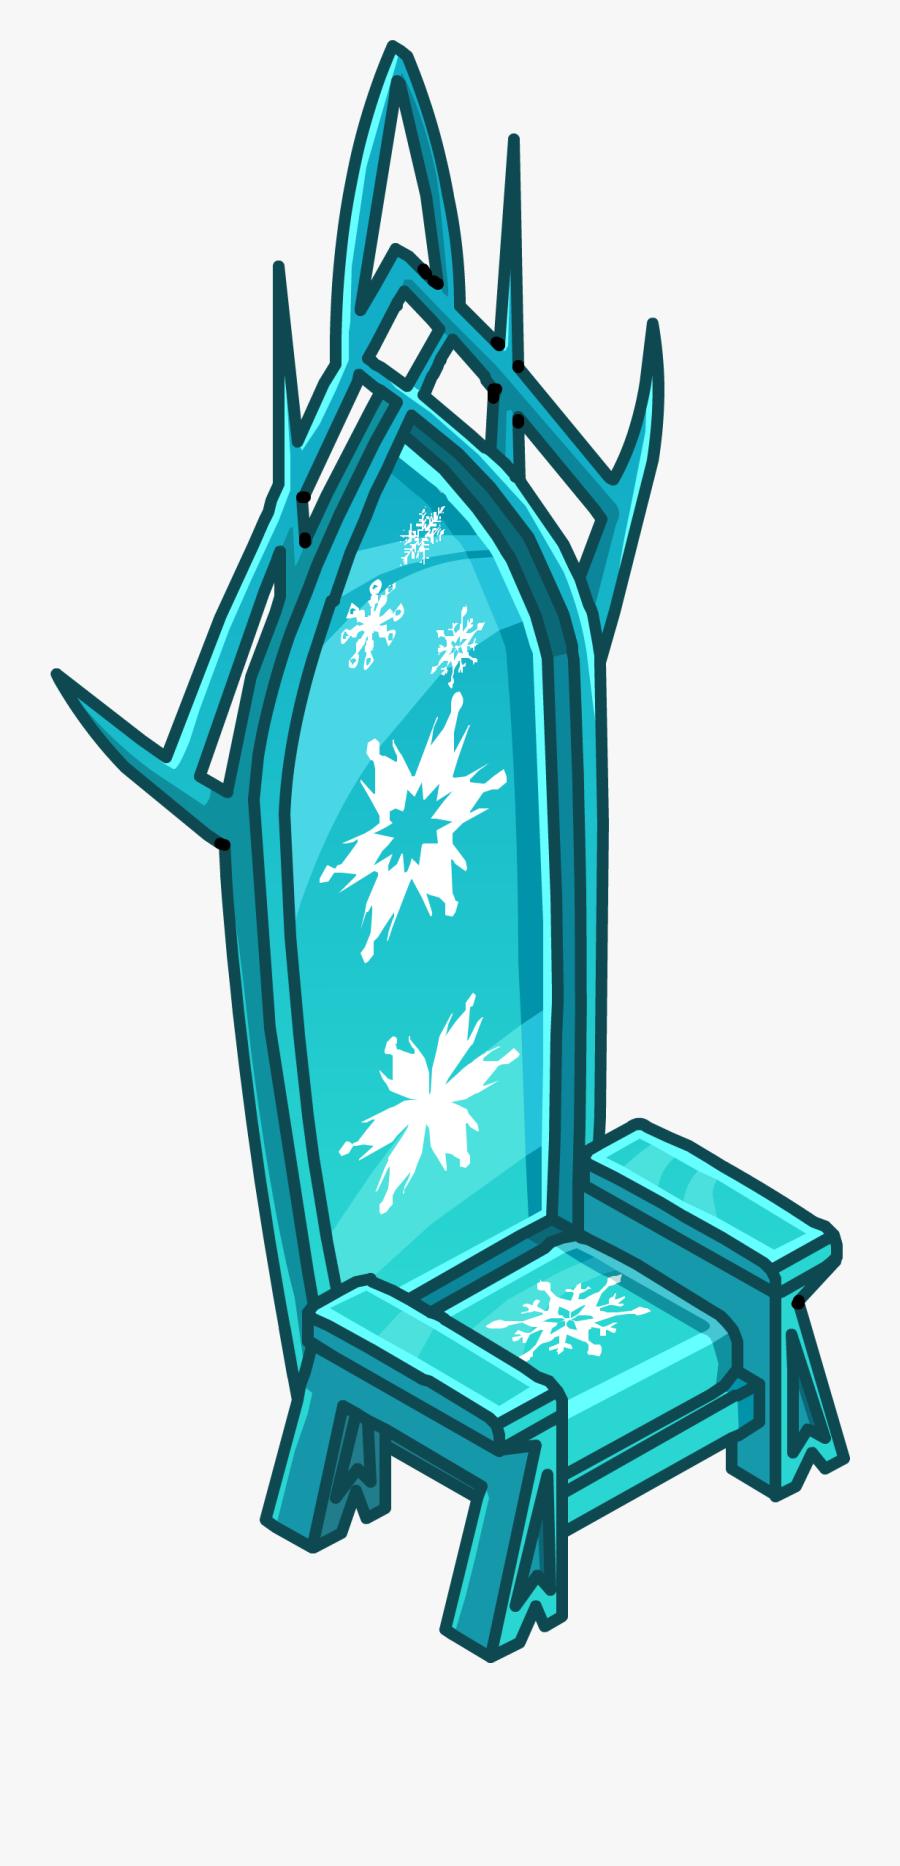 Frozen Throne Png.